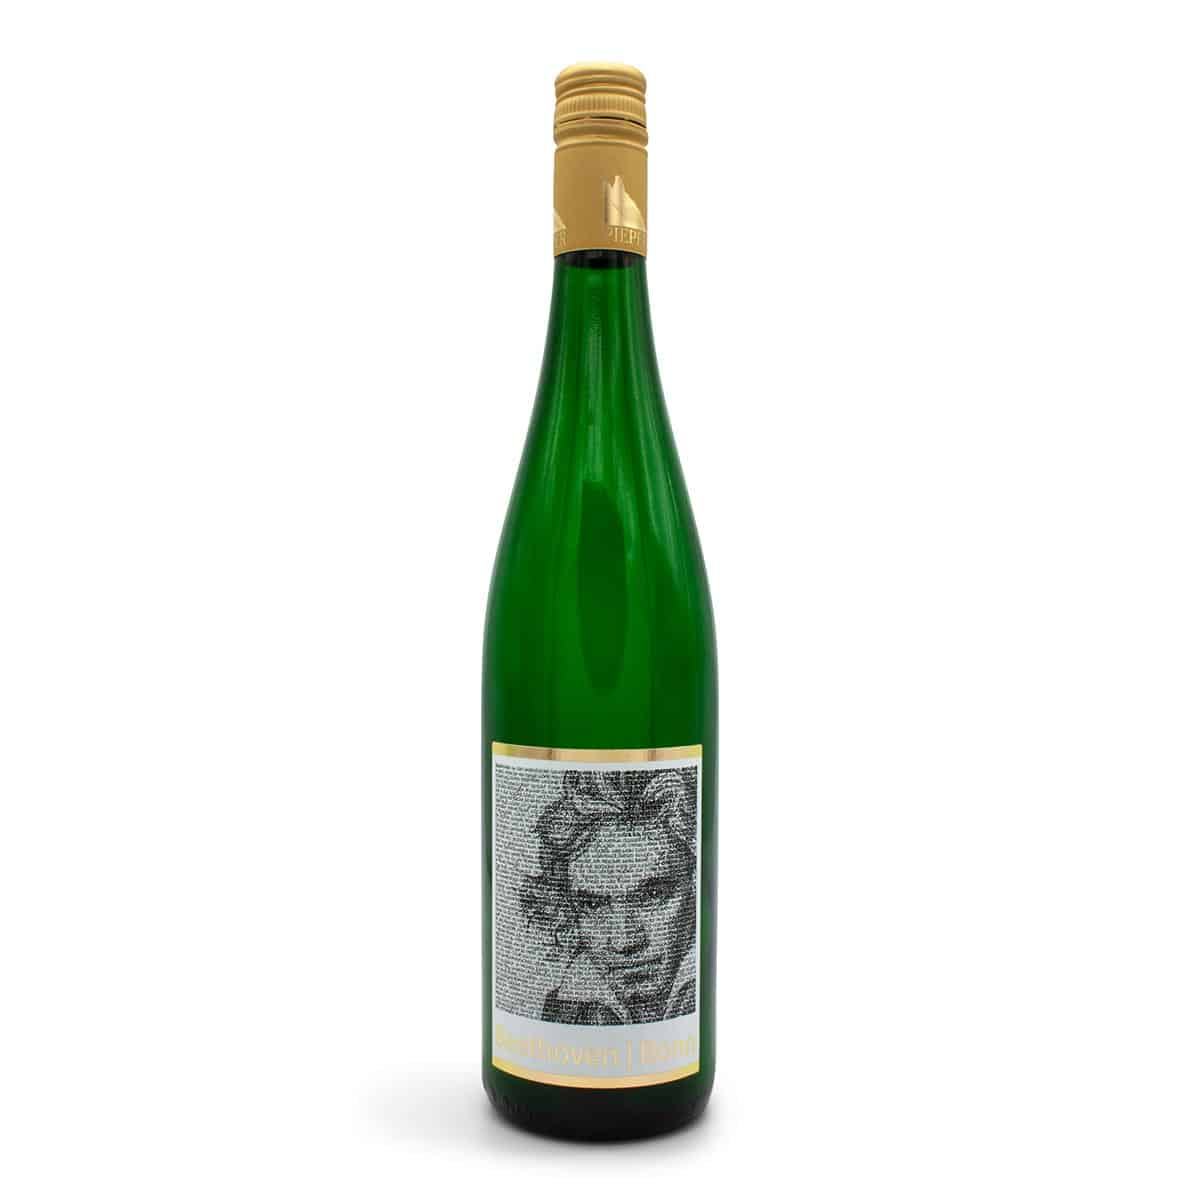 190708-Beethoven-Wein-Produktfoto-web.jpg